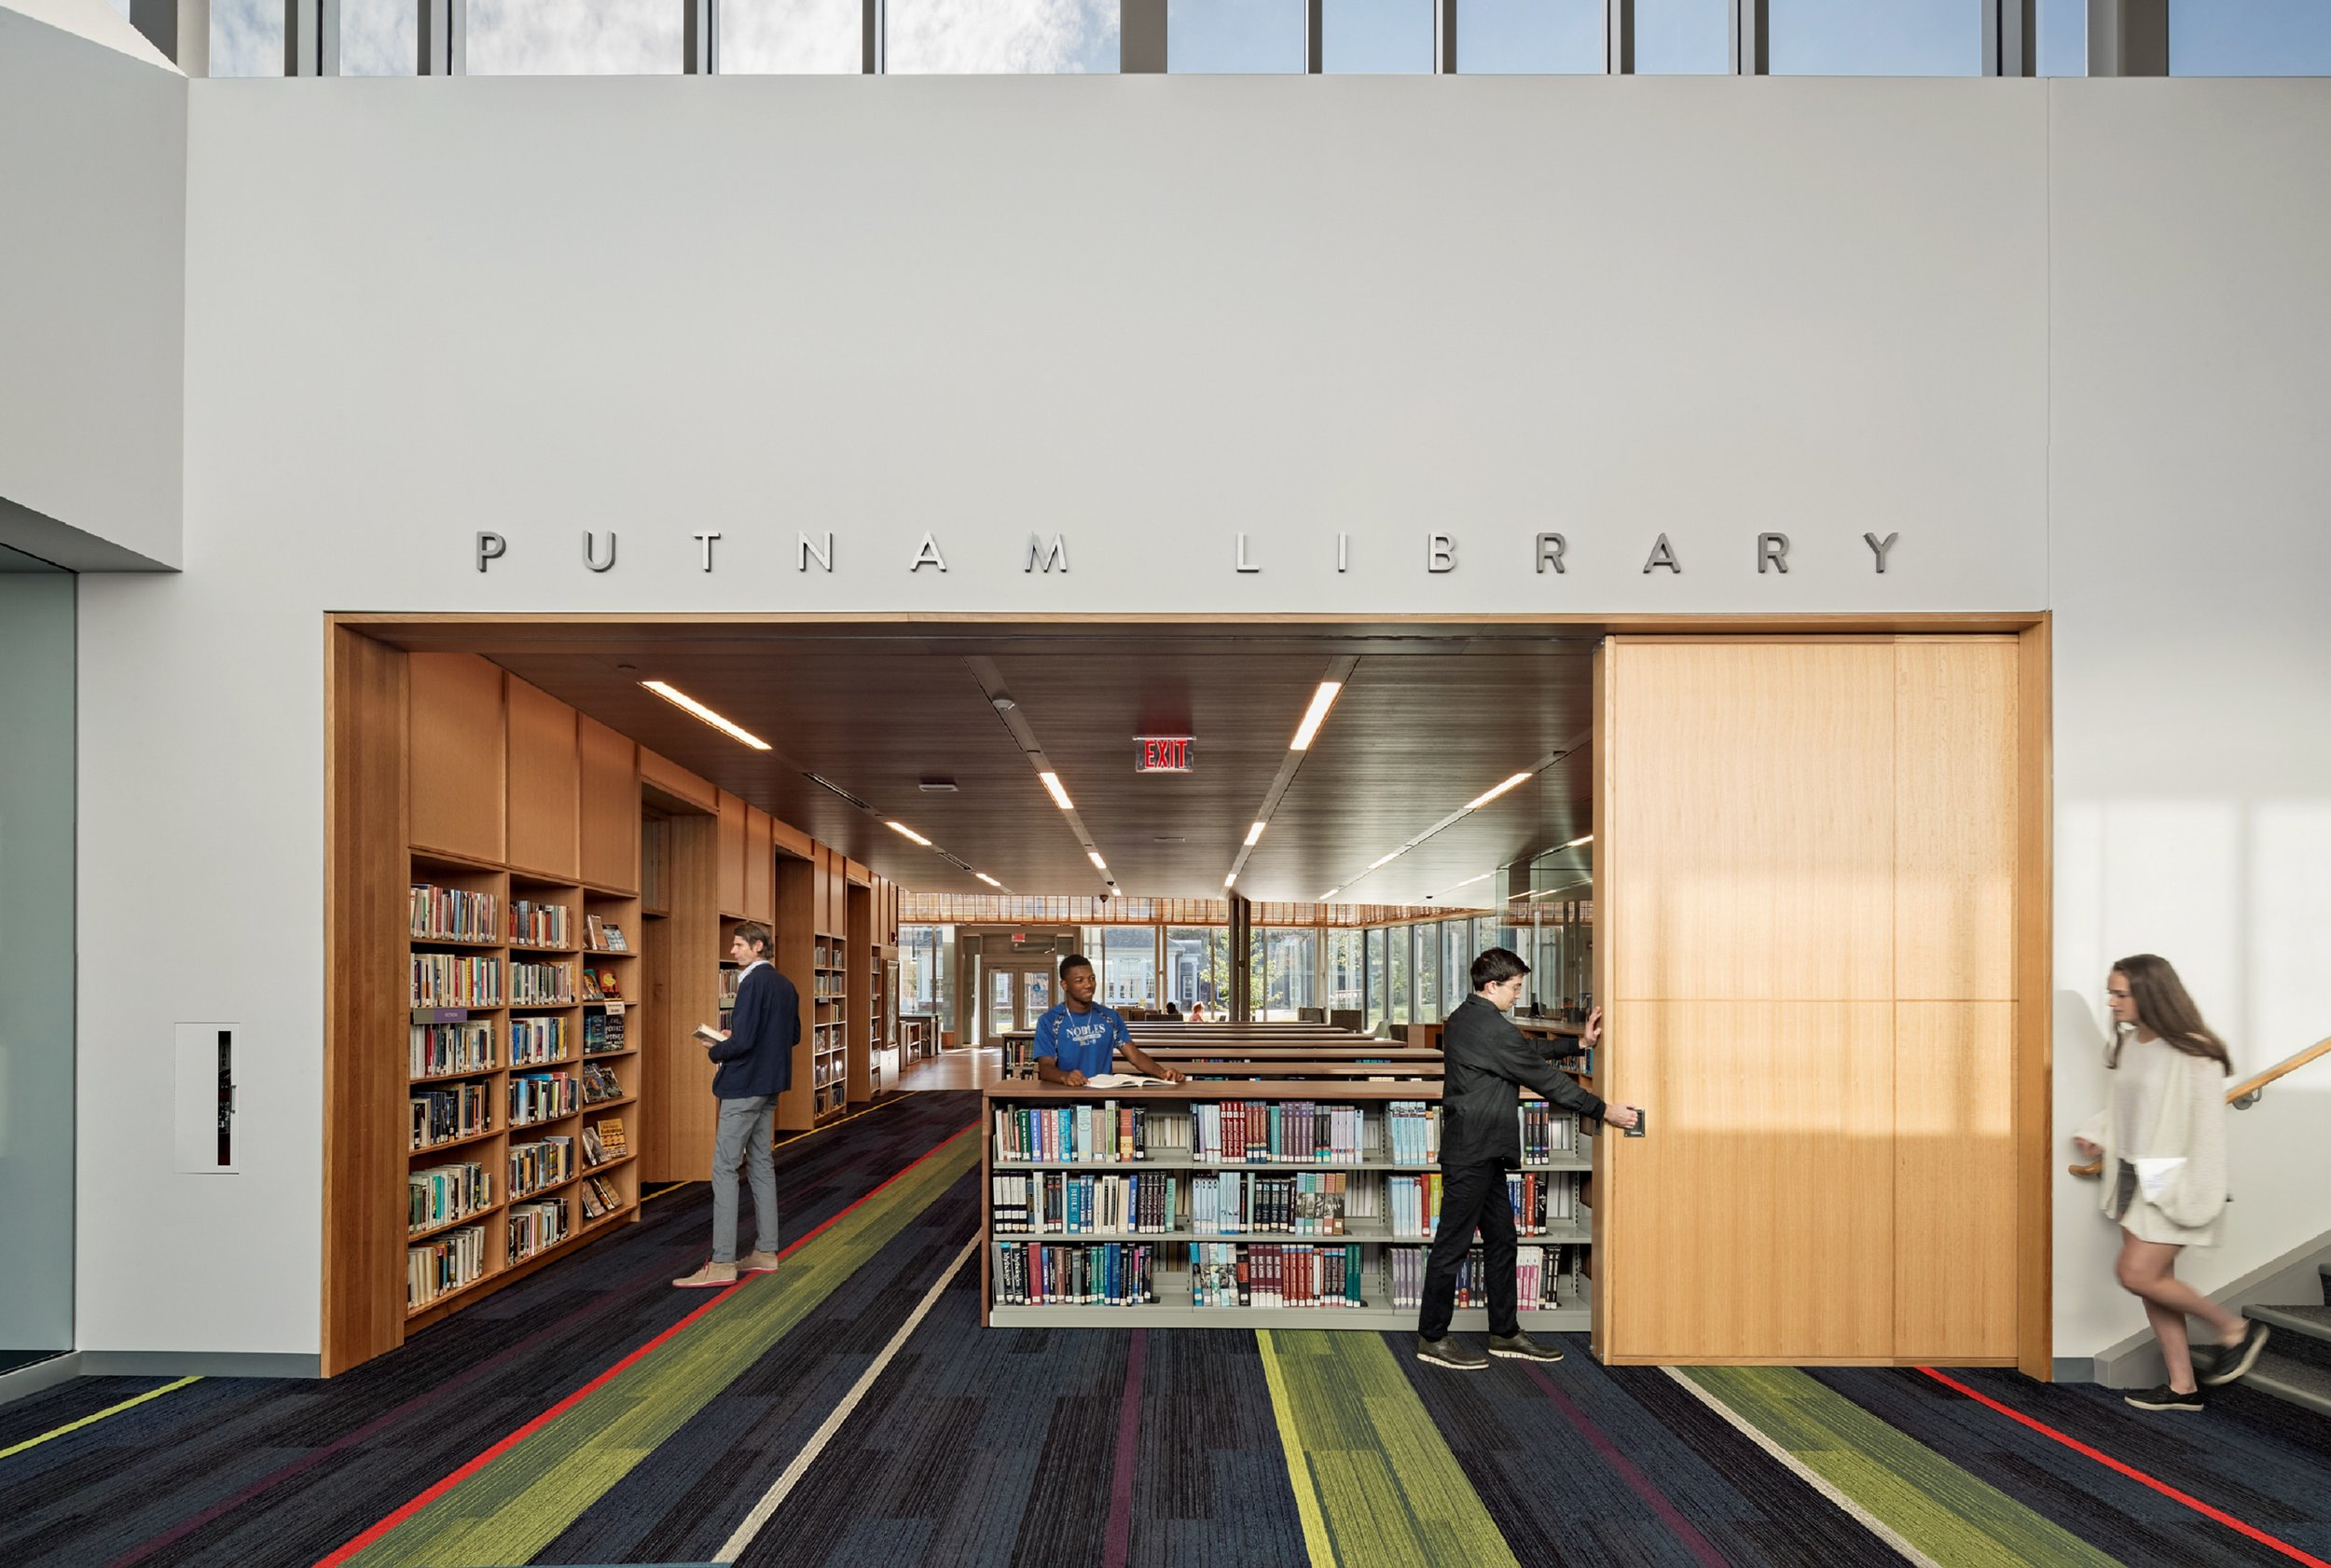 DEDHAM, MA - Noble & Greenough library